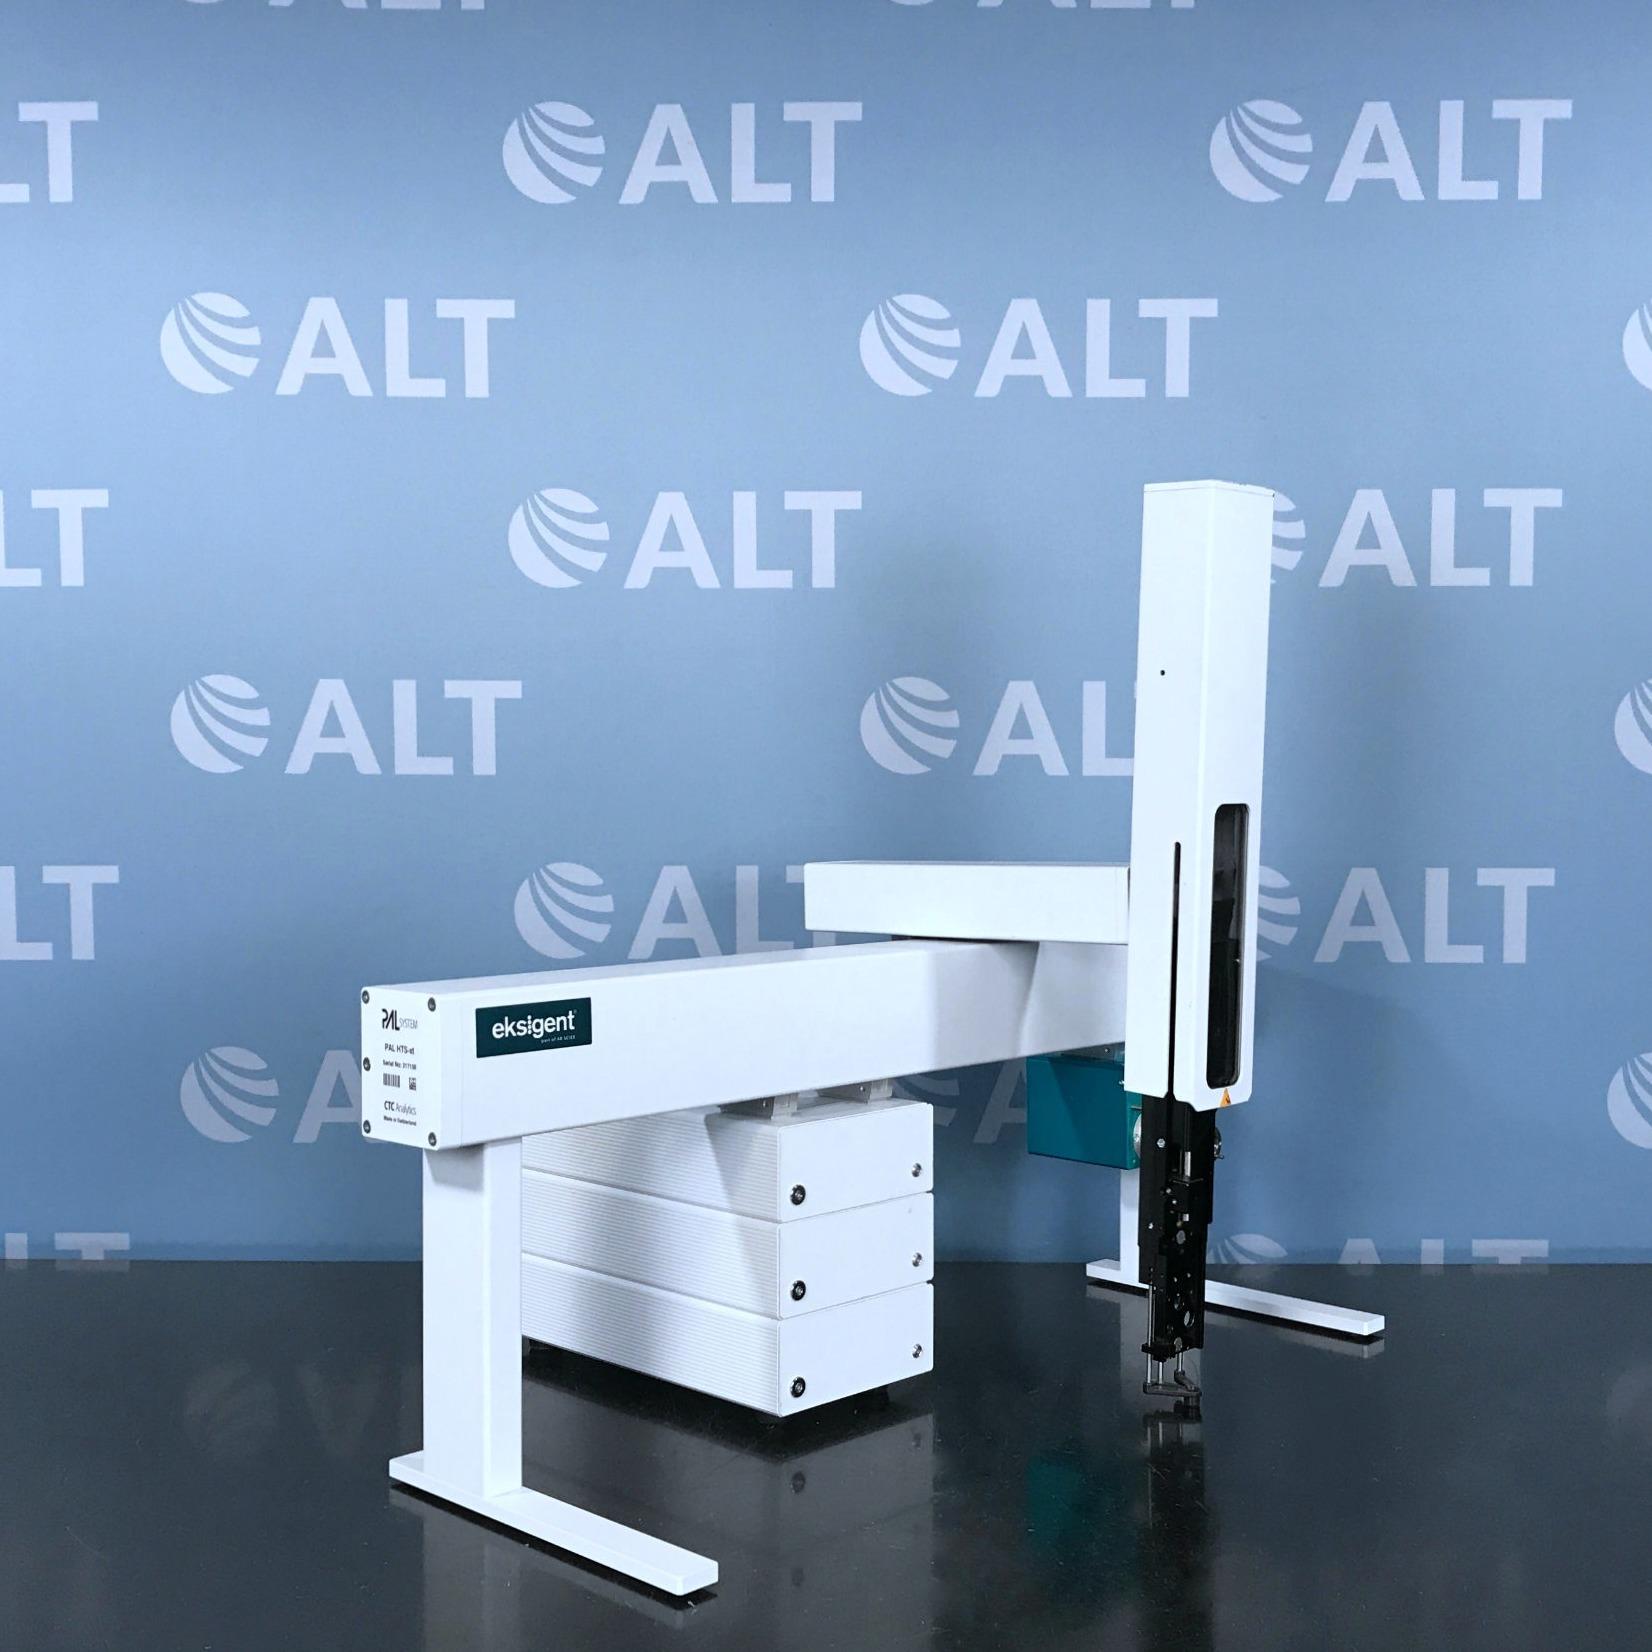 Eksigent PAL HTS-XT Autosampler Image